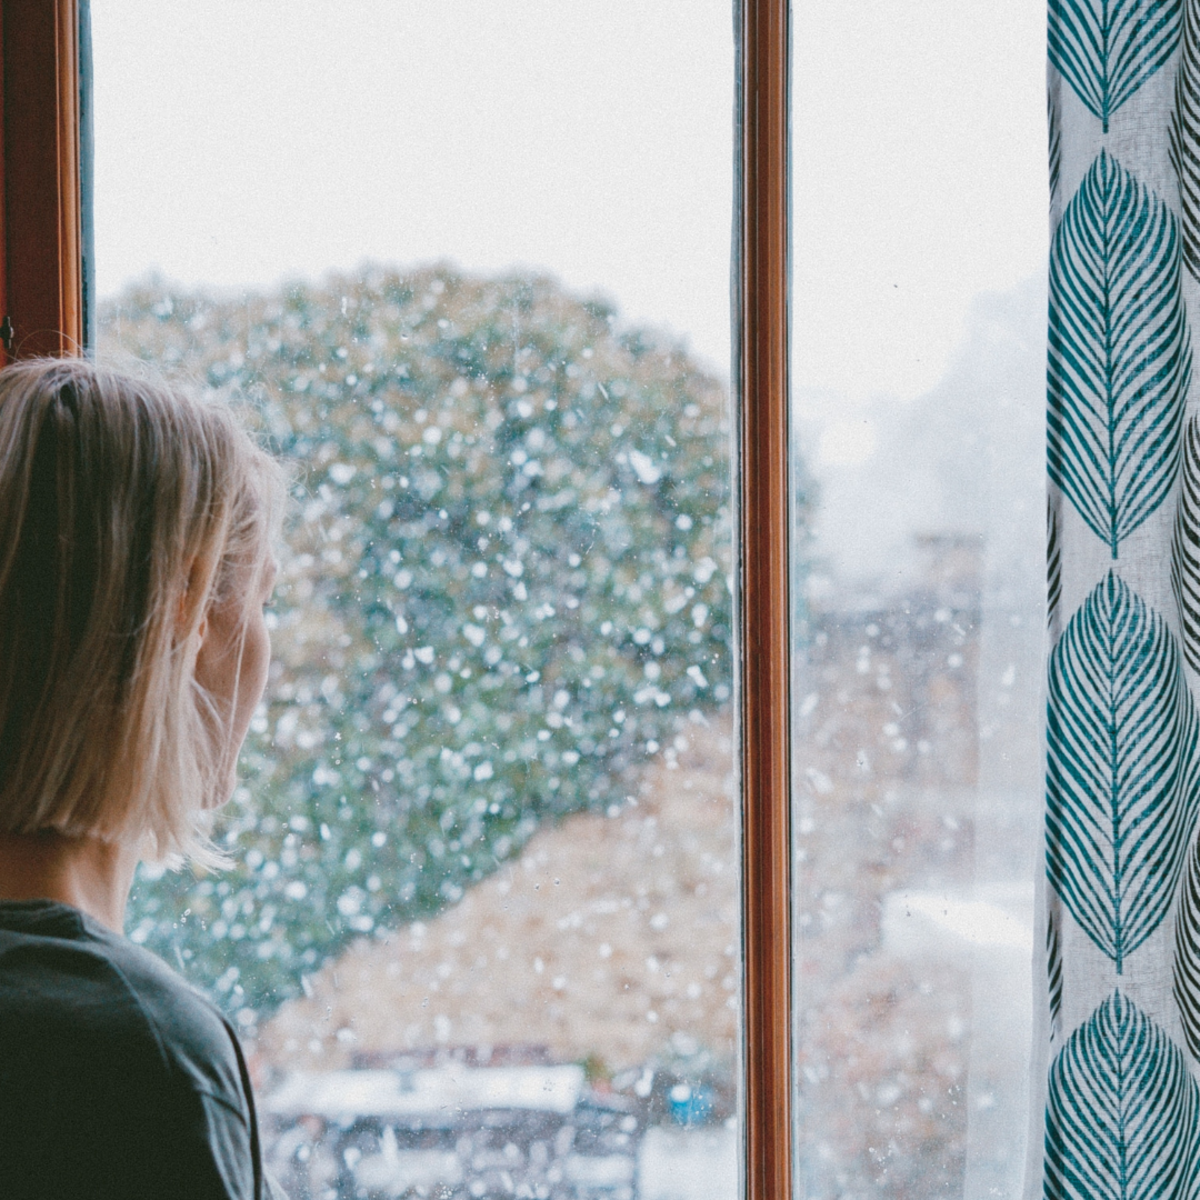 Sadness and Depression in Winter: Seasonal Affective Disorder (SAD)